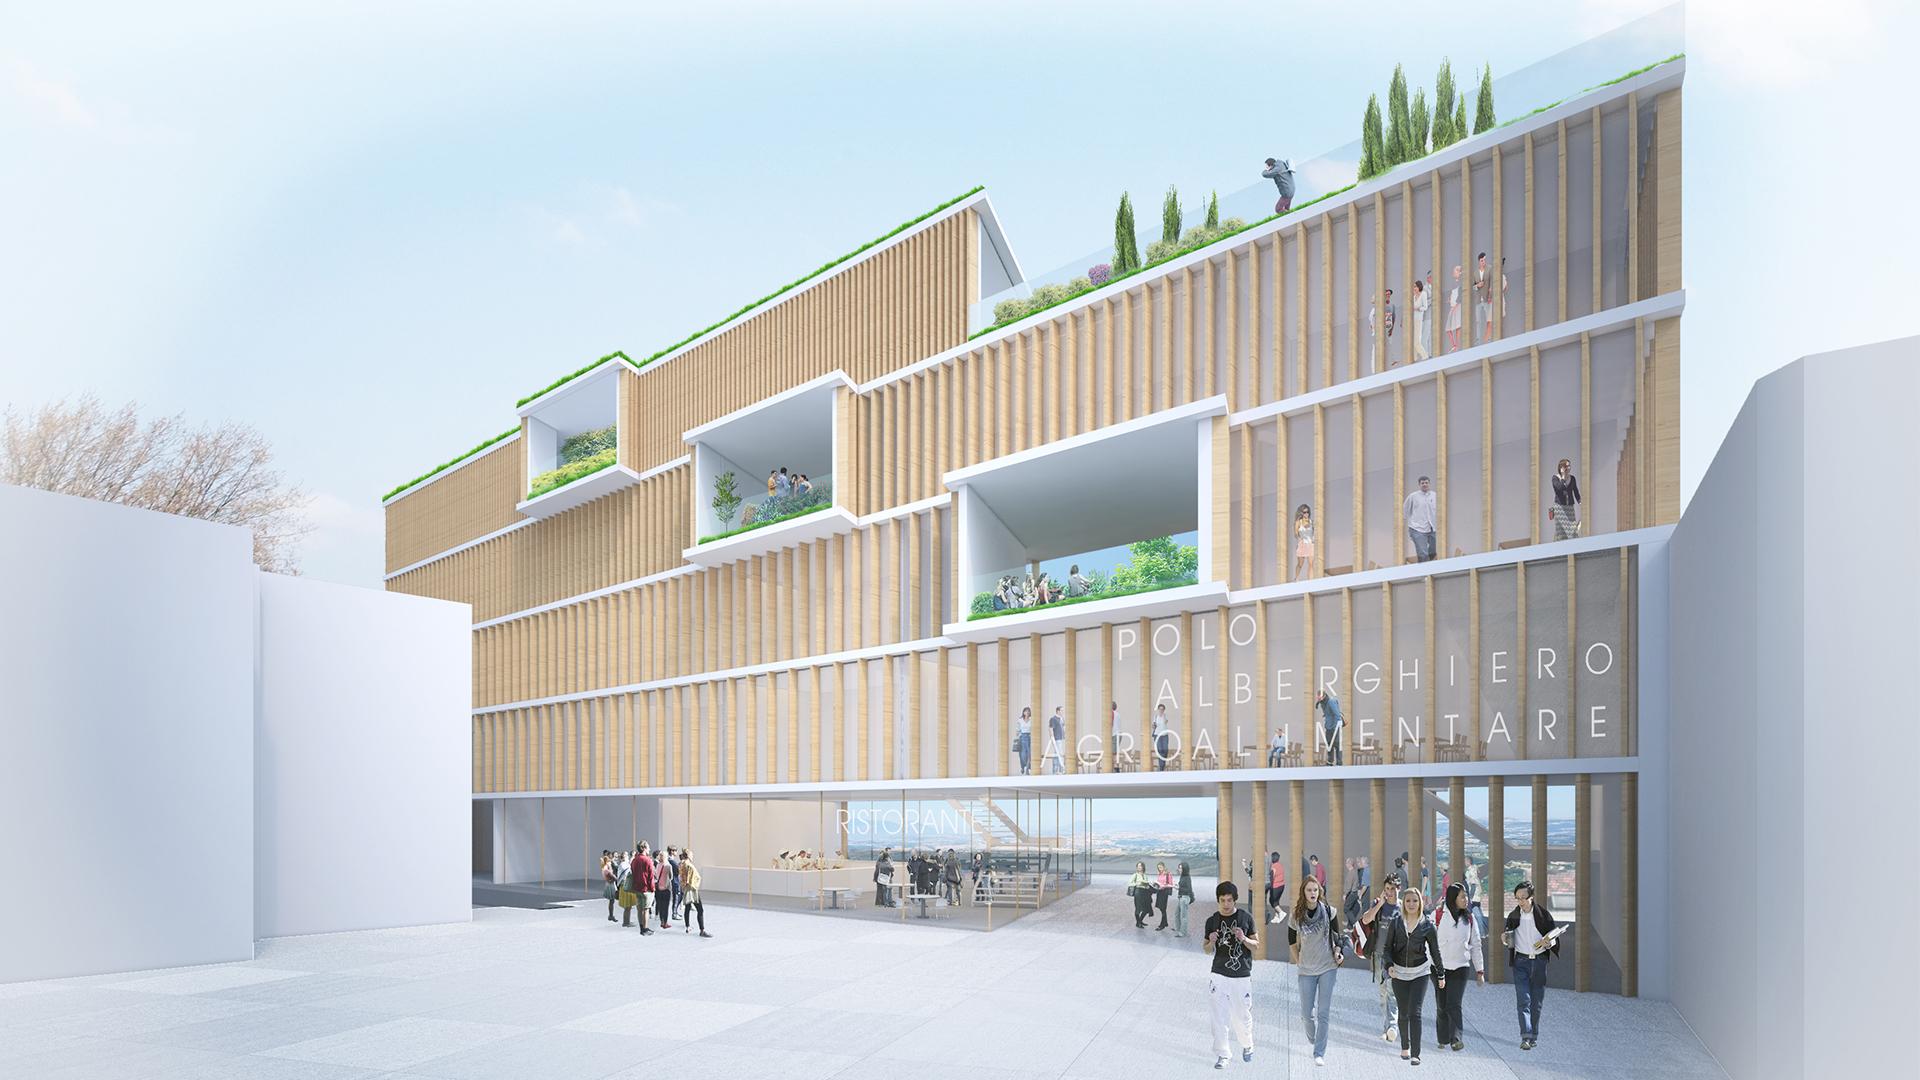 NEW CULINARY SCHOOL IN ARIANO IRPINO